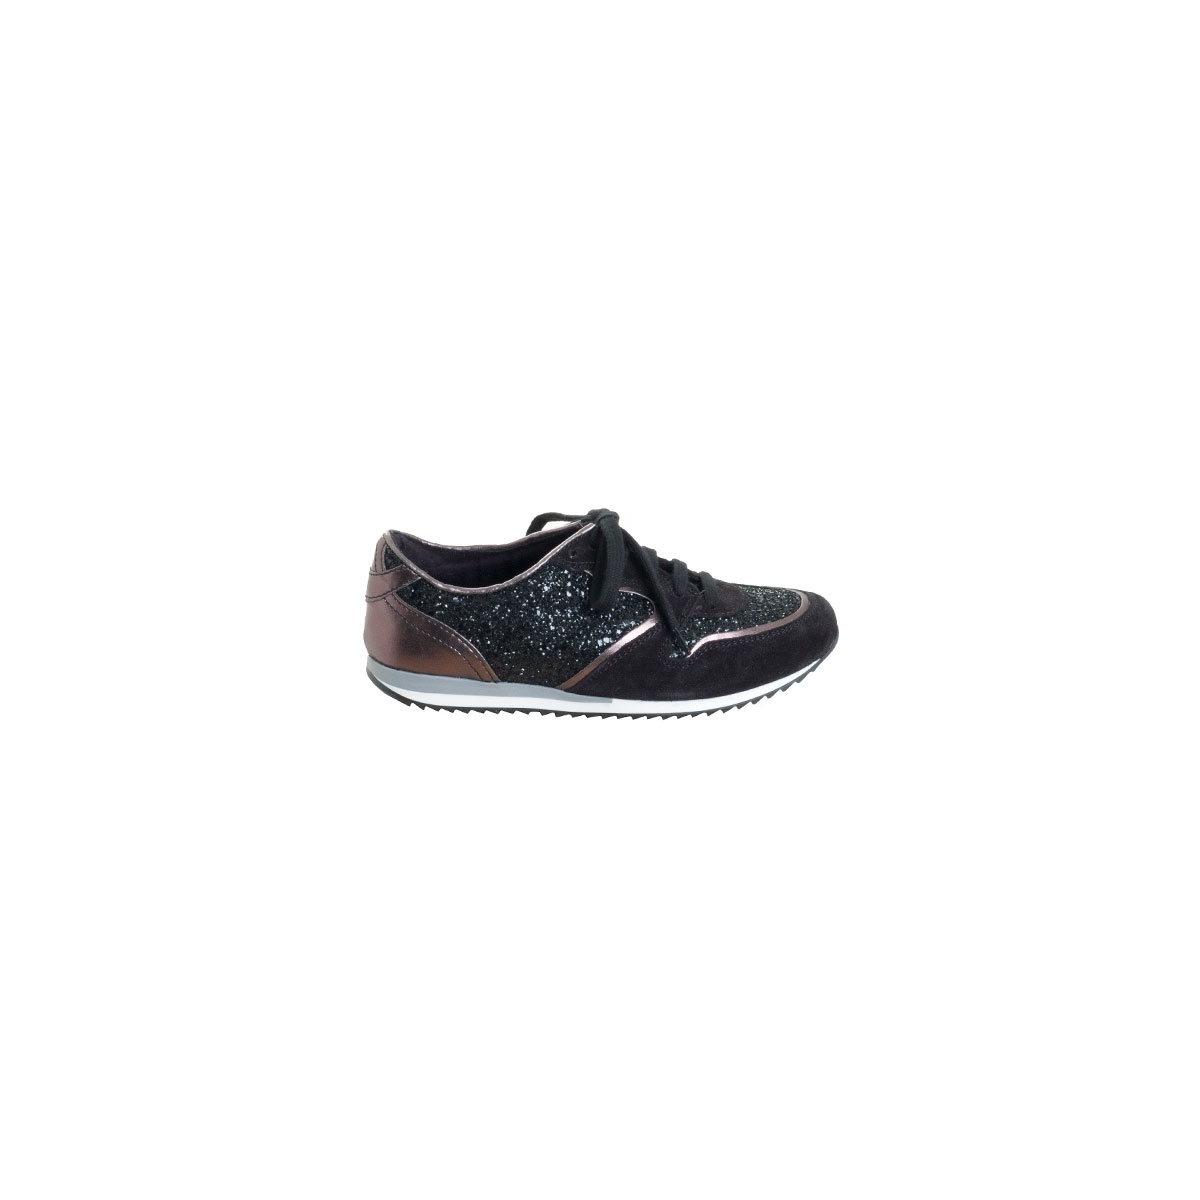 1-23620-35 1 tamaris sneaker black/glitter